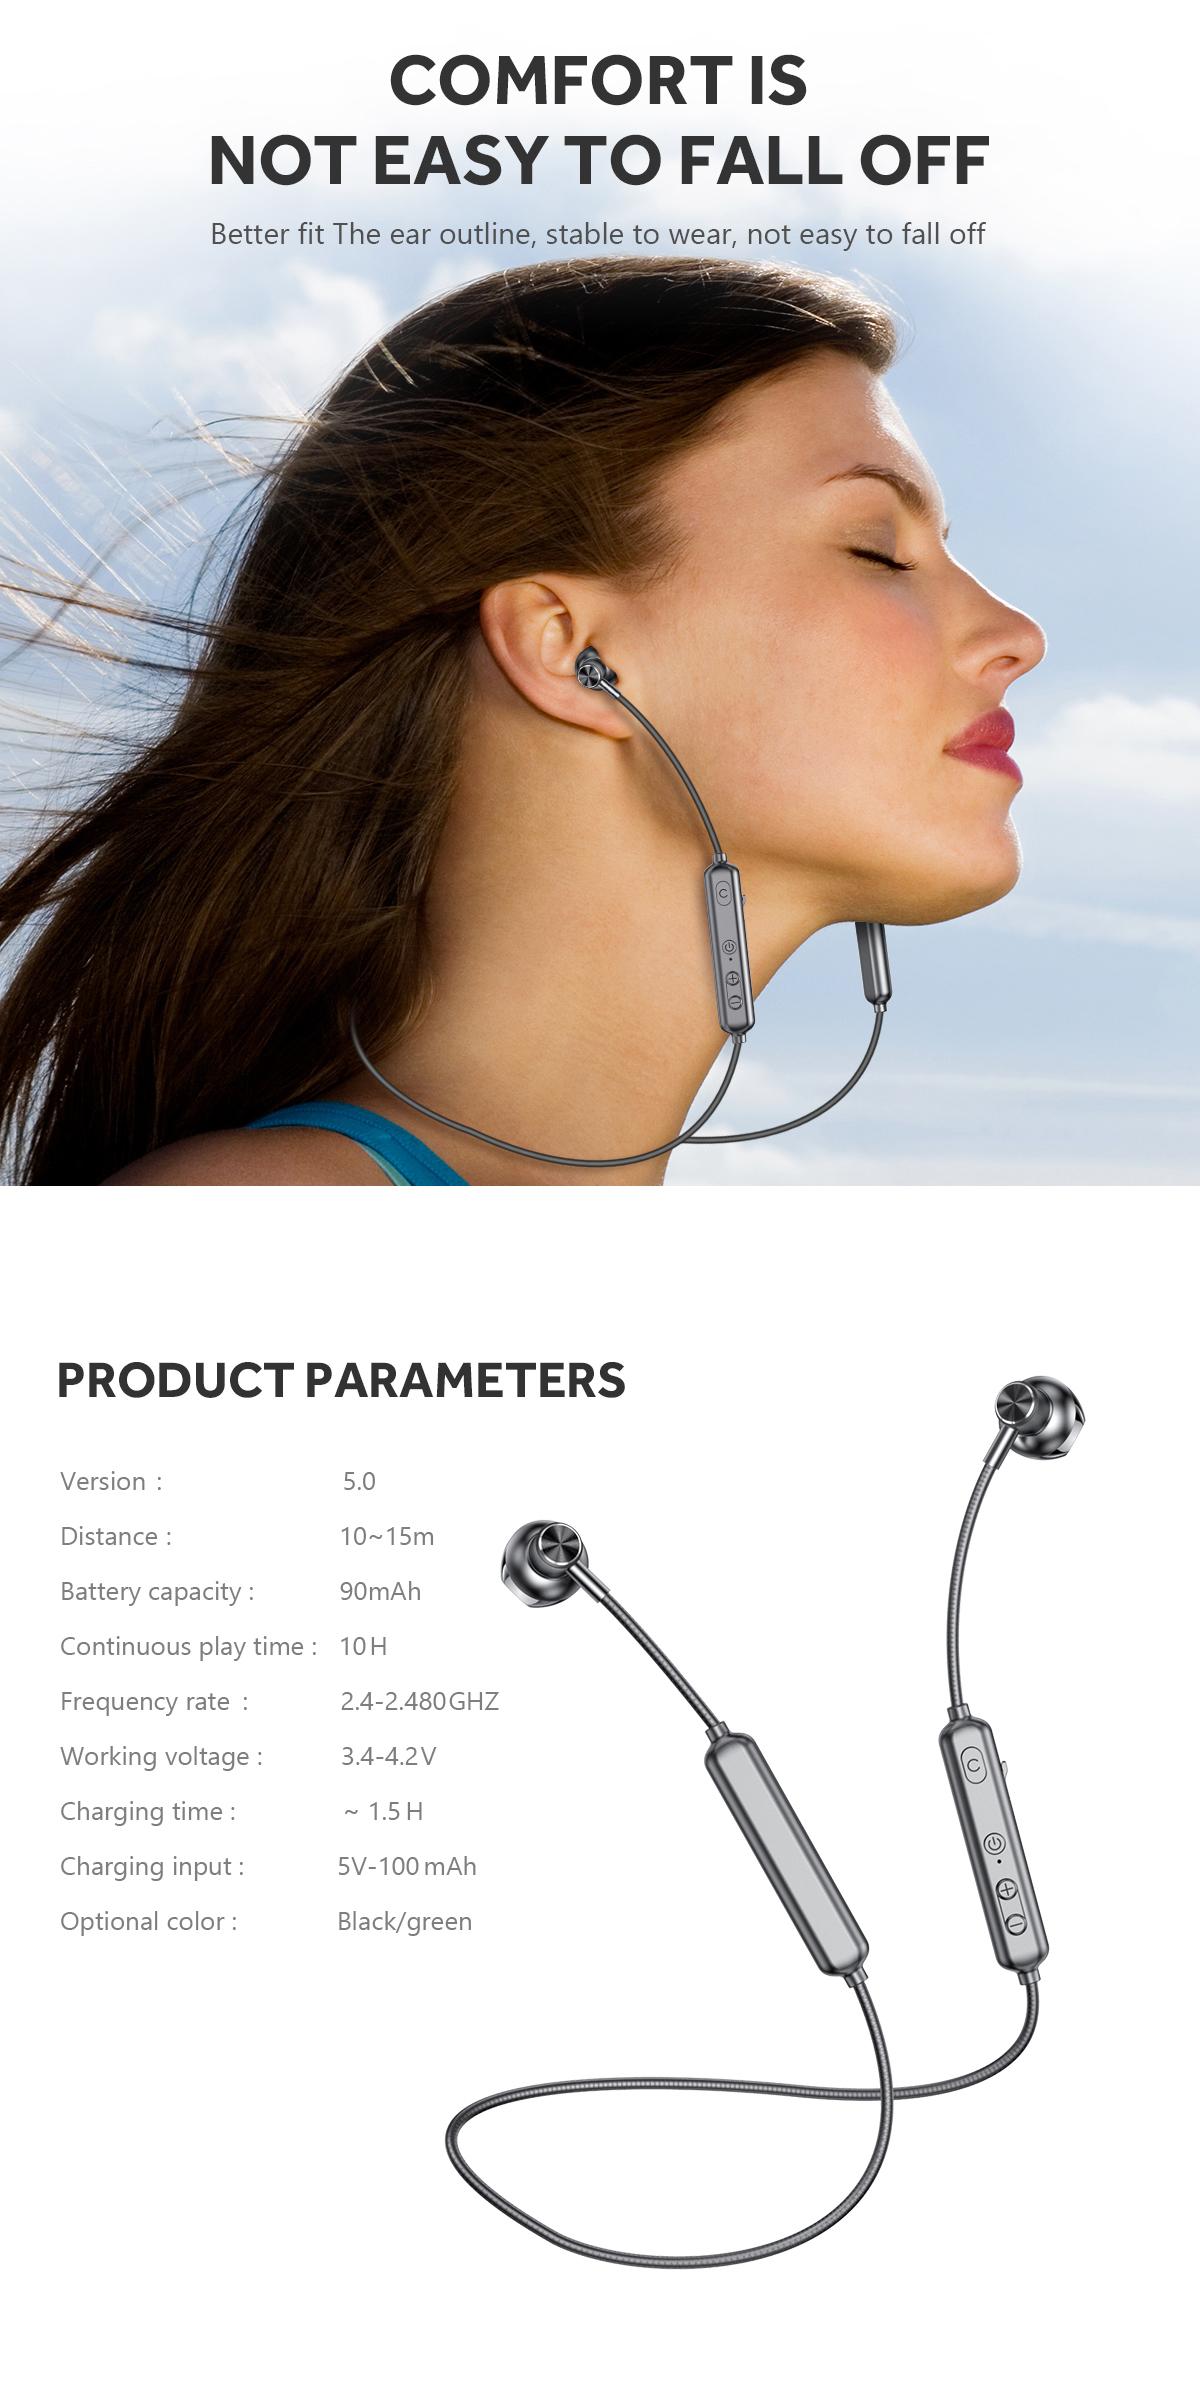 2021 new wireless TWS gaming noise cancelling earbuds wireless earphones neckband earphones headphones headsets